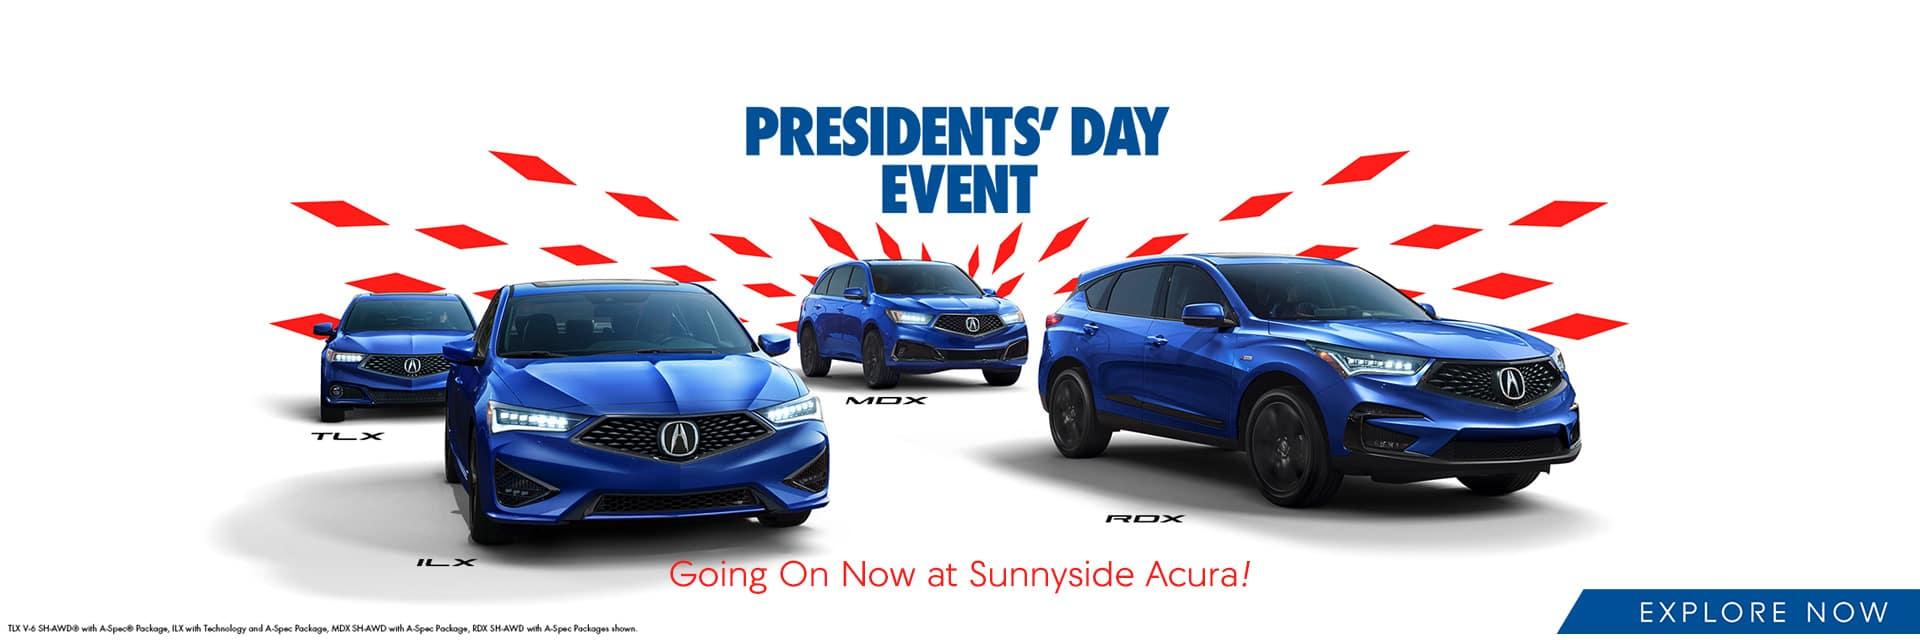 Acura Presidents' Day Event Sunnyside Acura Nashua, NH 03063